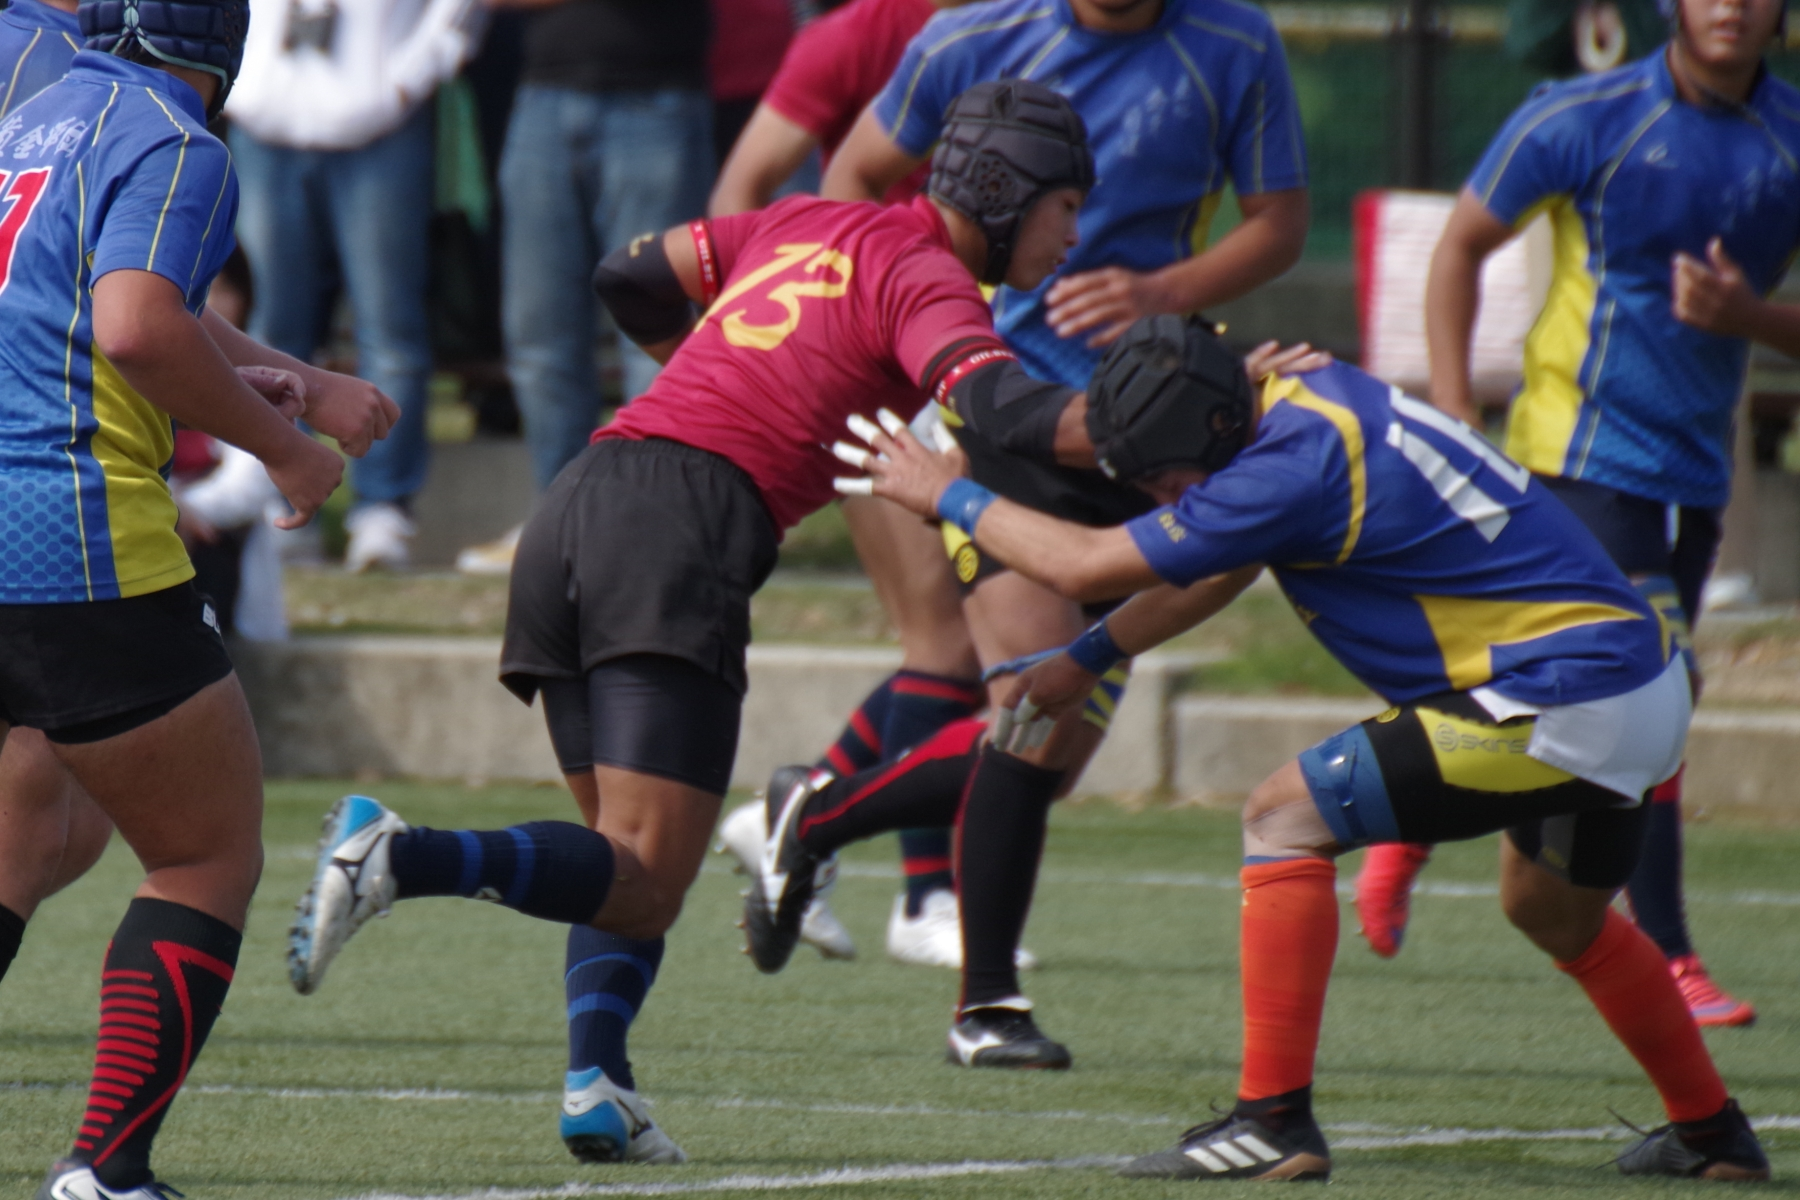 http://kokura-rugby.sakura.ne.jp/181014_112636_0290.jpg